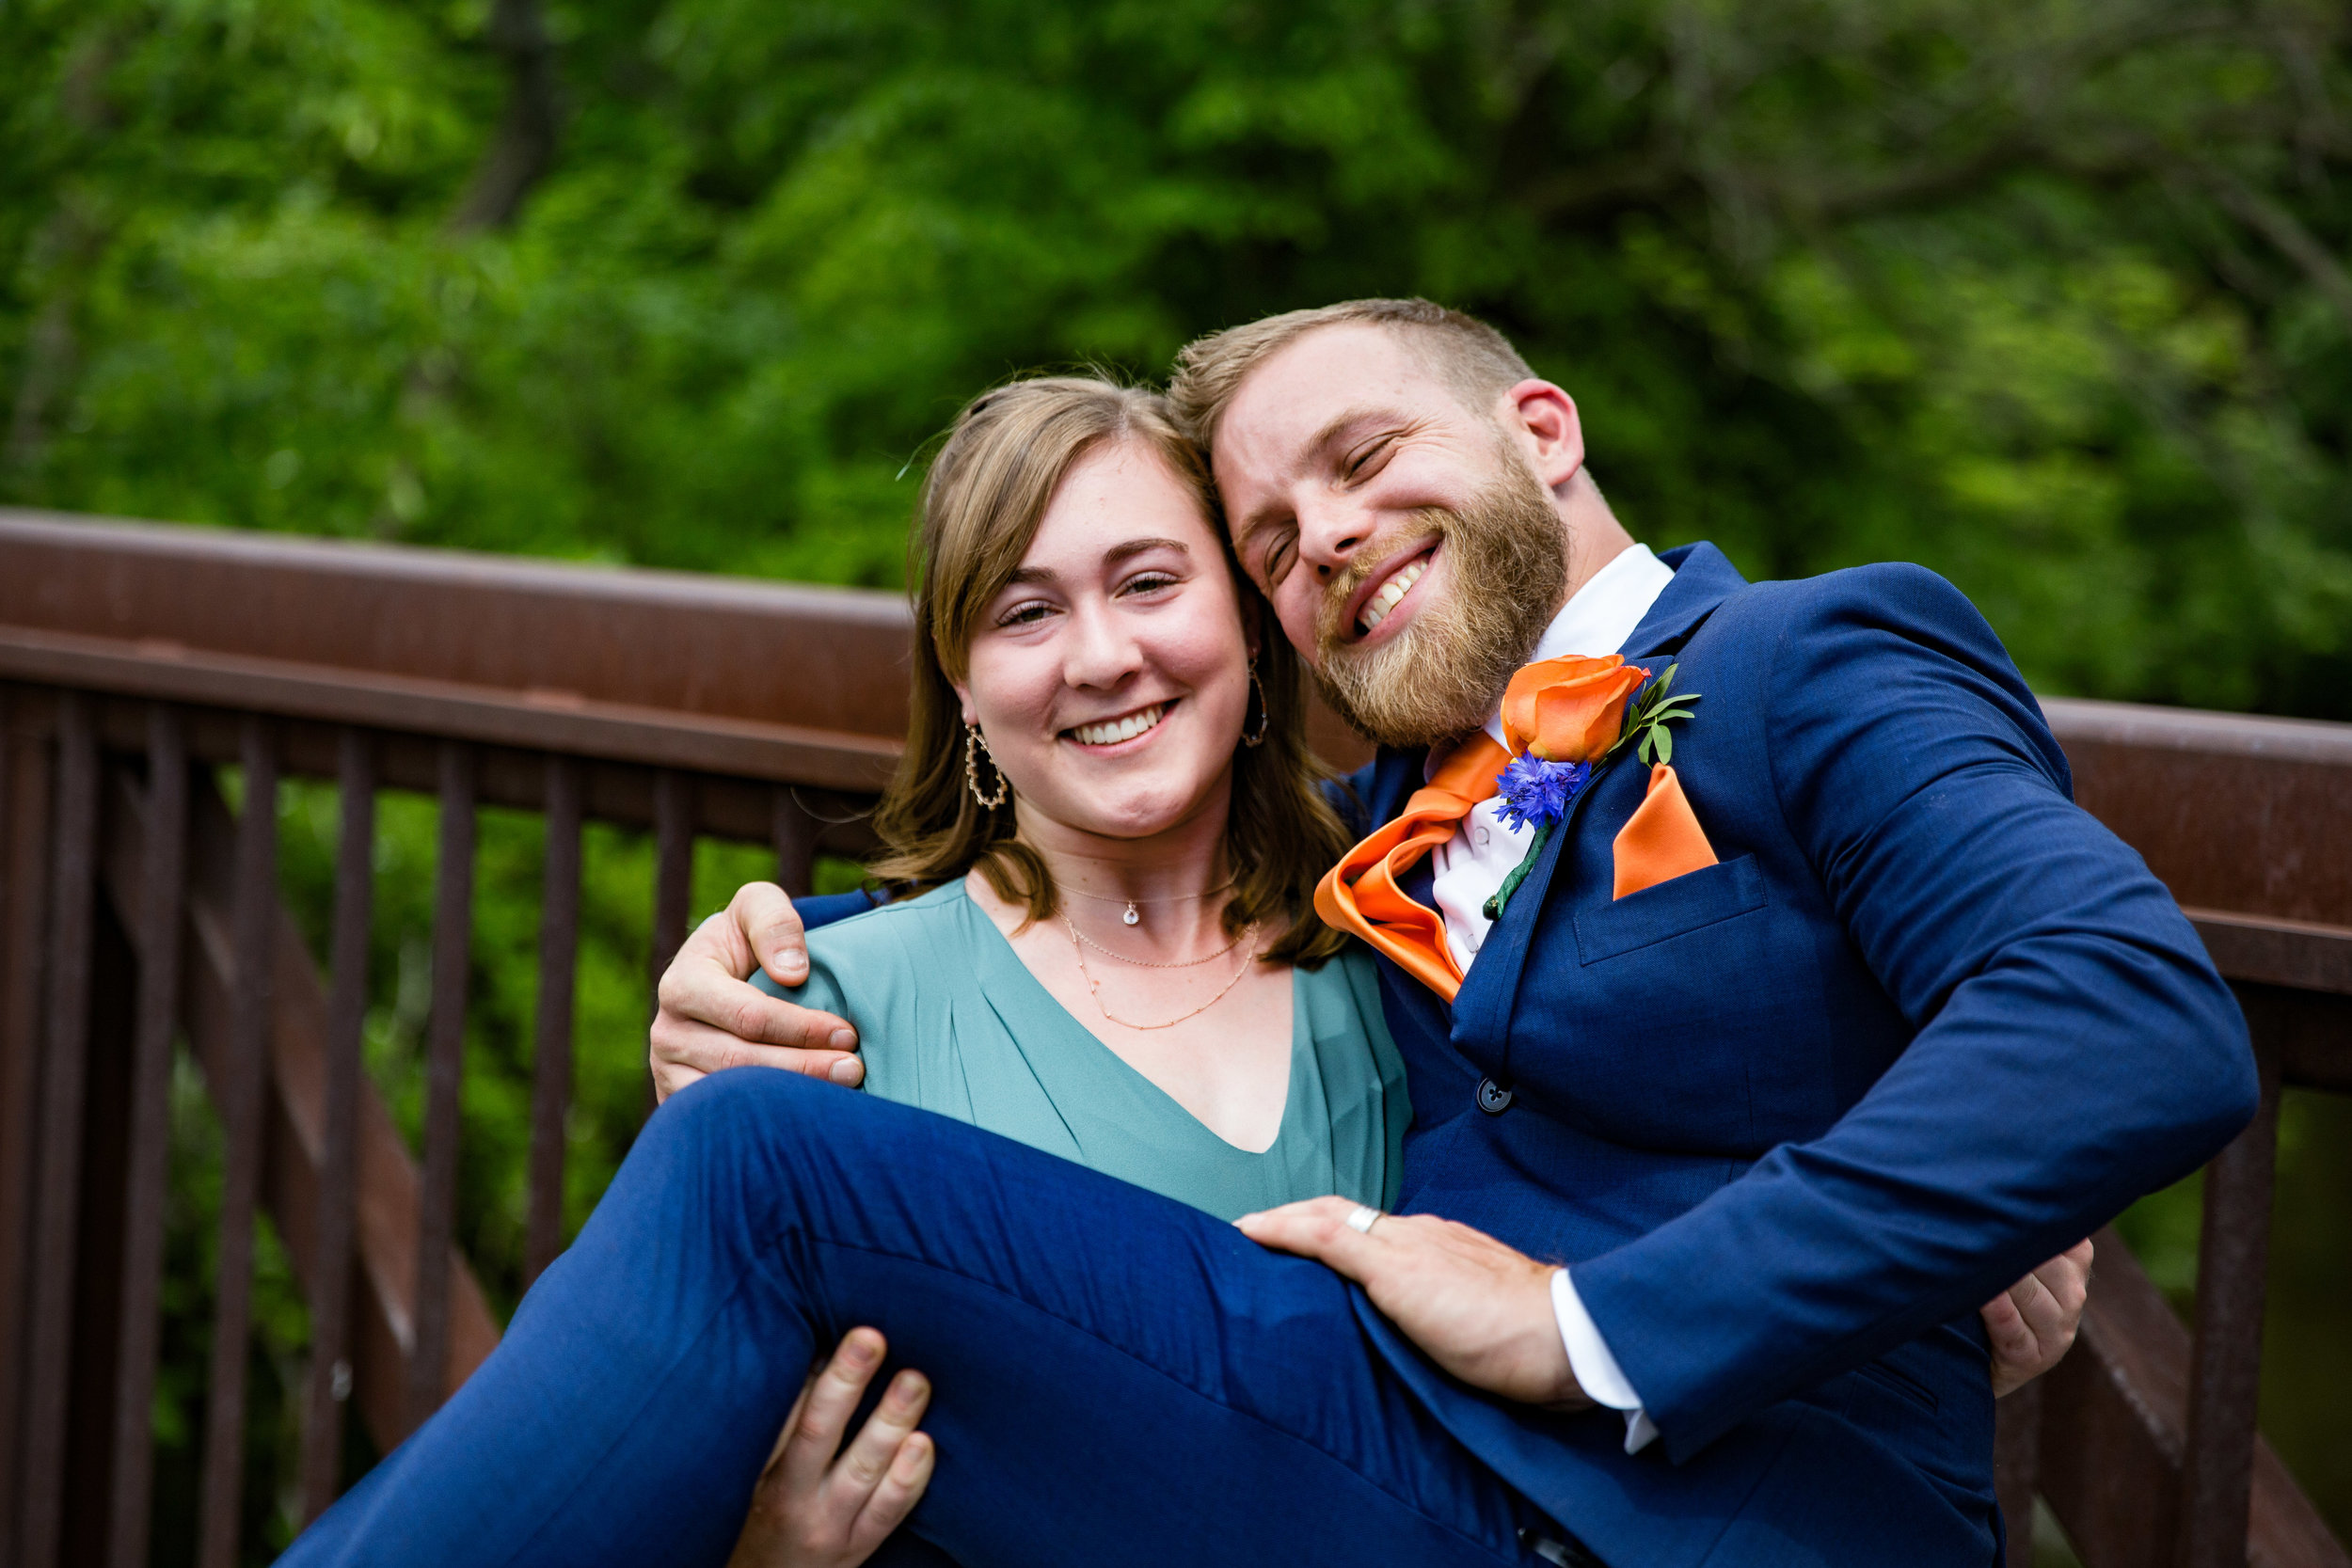 Natalie and Dallas Mooney Wedding 6-8-19_Tania Watt Photography-258.jpg